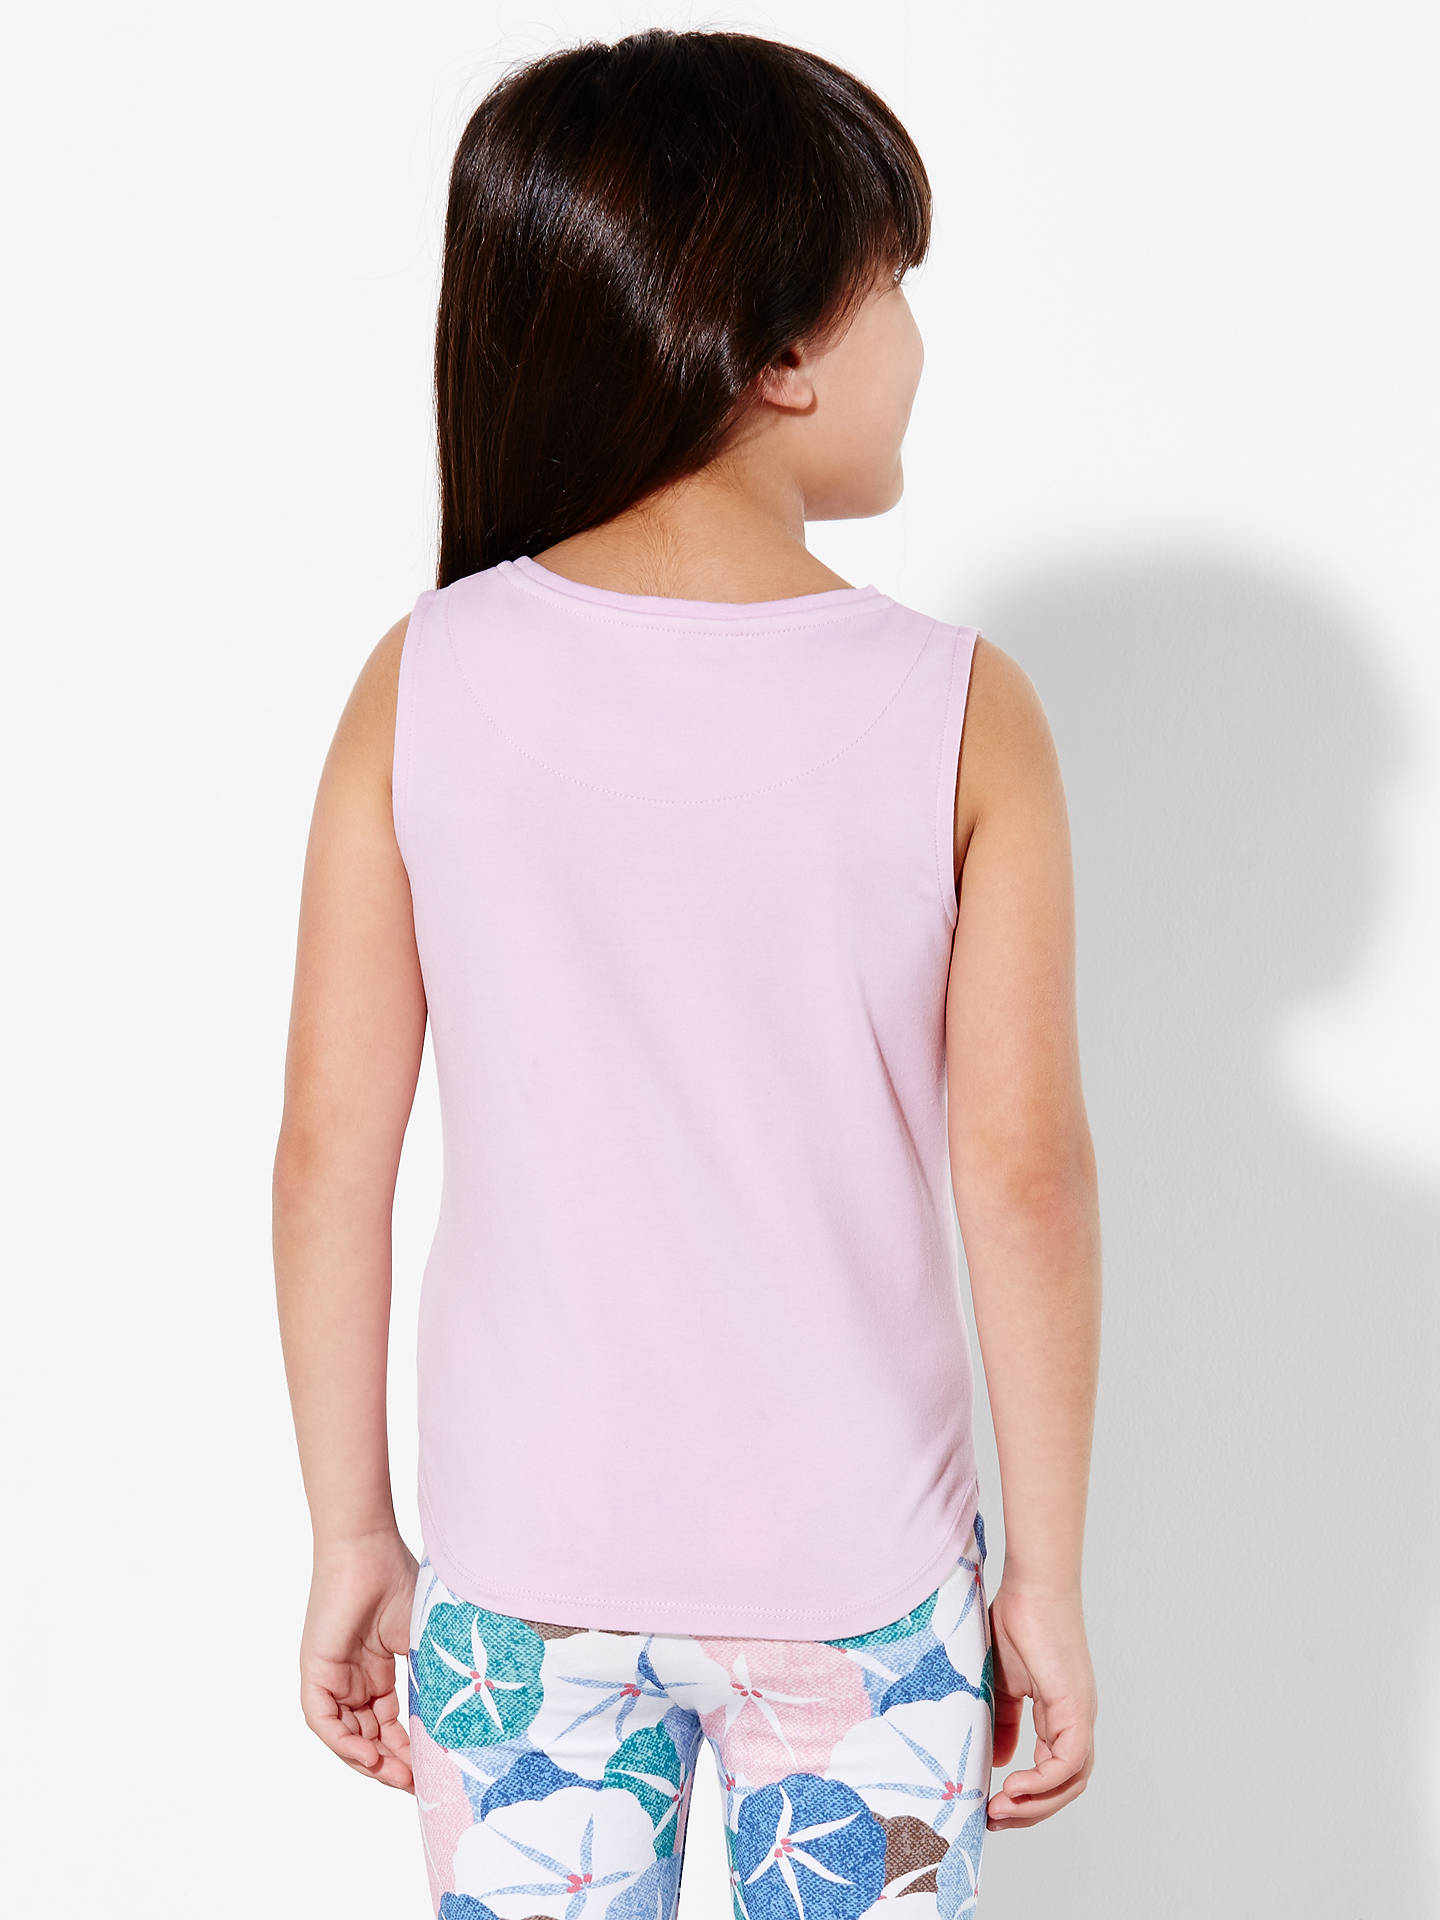 172e7e2517d46 ... BuyJohn Lewis Girls  Tropical Print Vest Top